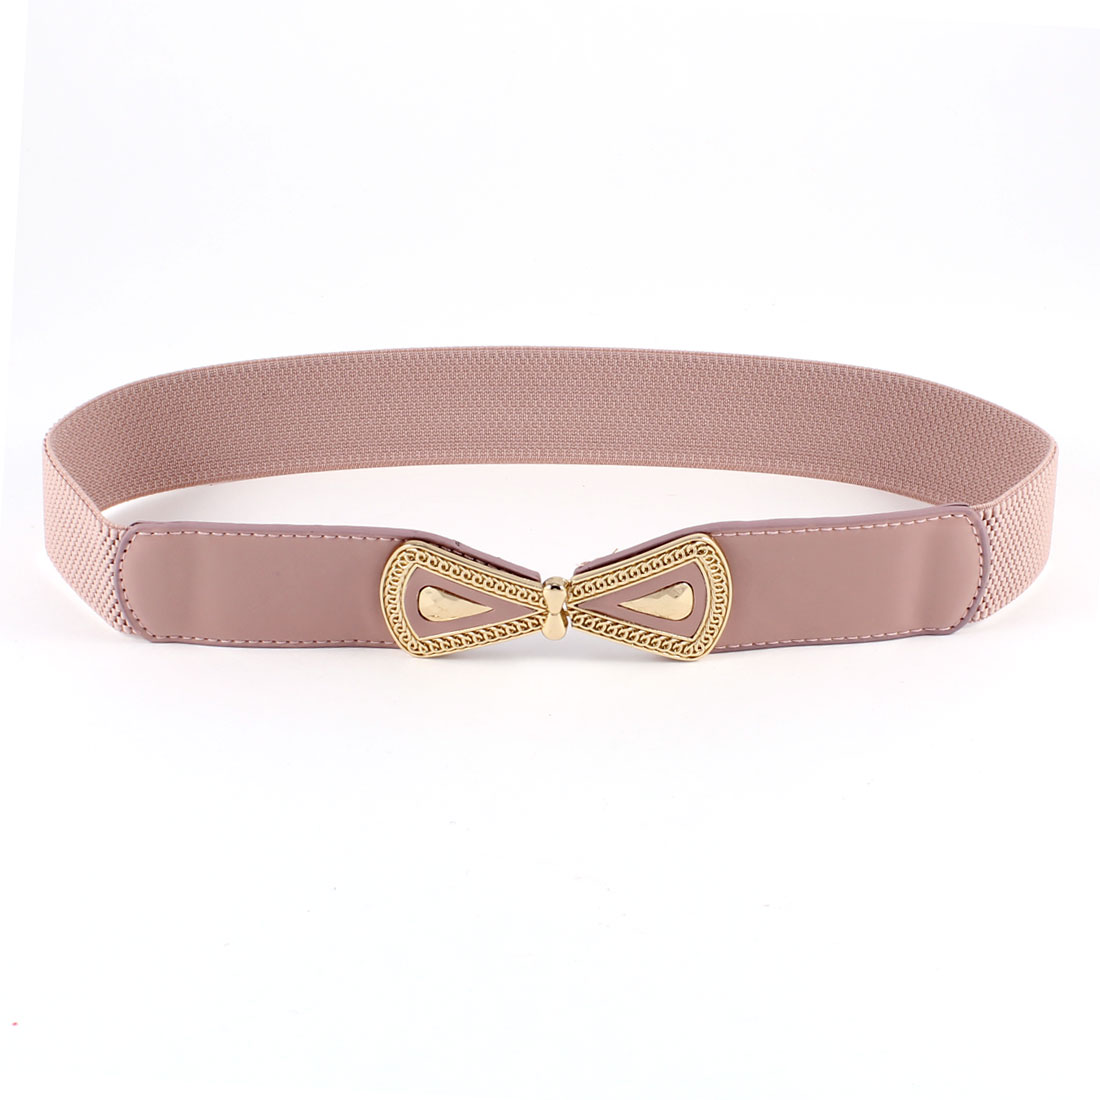 Woman Pink Gold Tone Bowtie Interlocking Closure Stretchy Waistband Cinch Belt